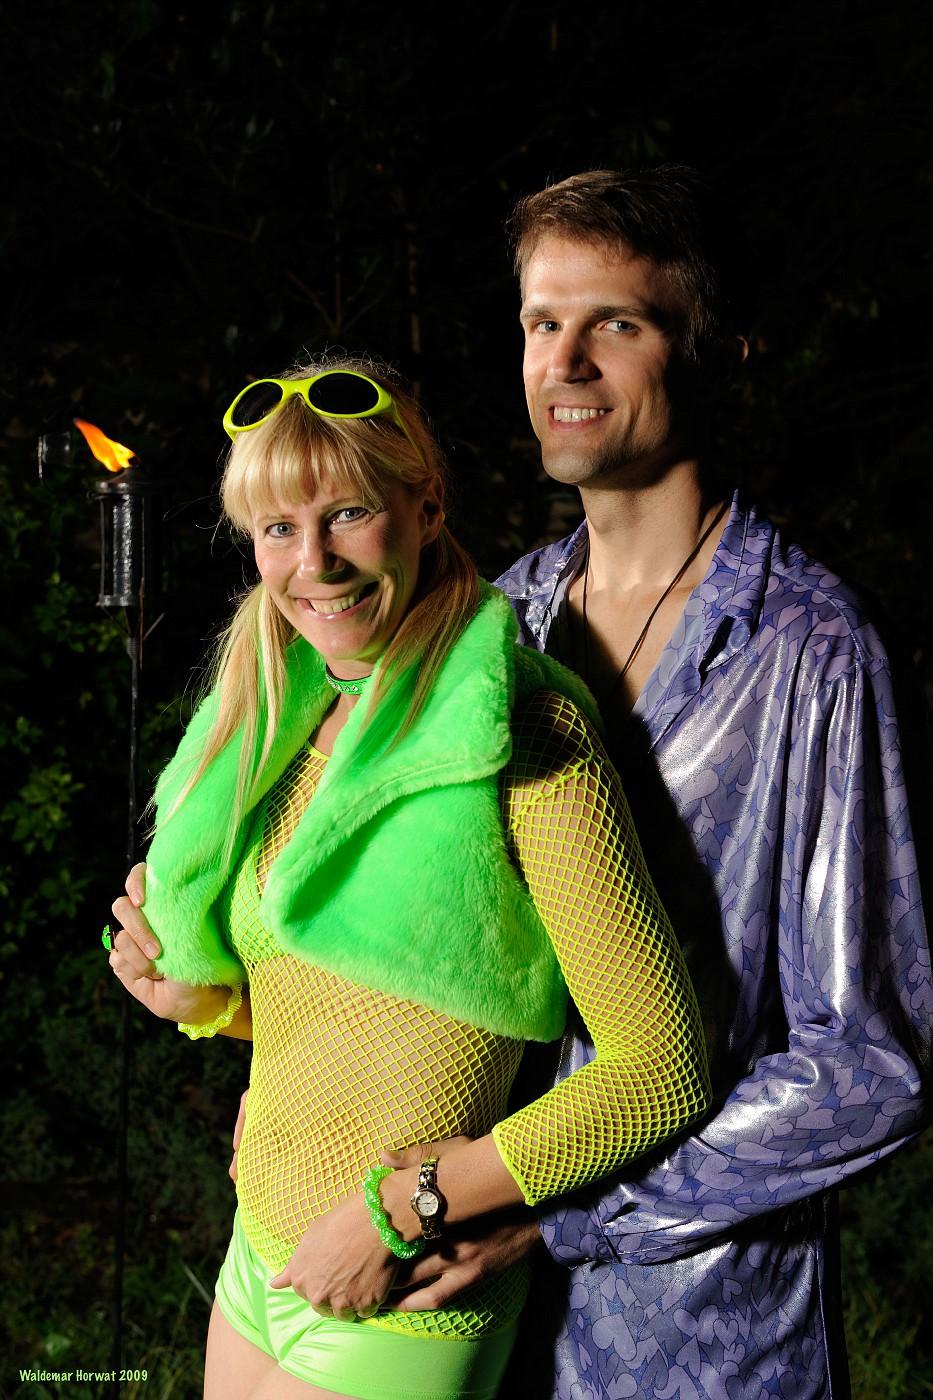 Glow Girl and Playa Meerkat